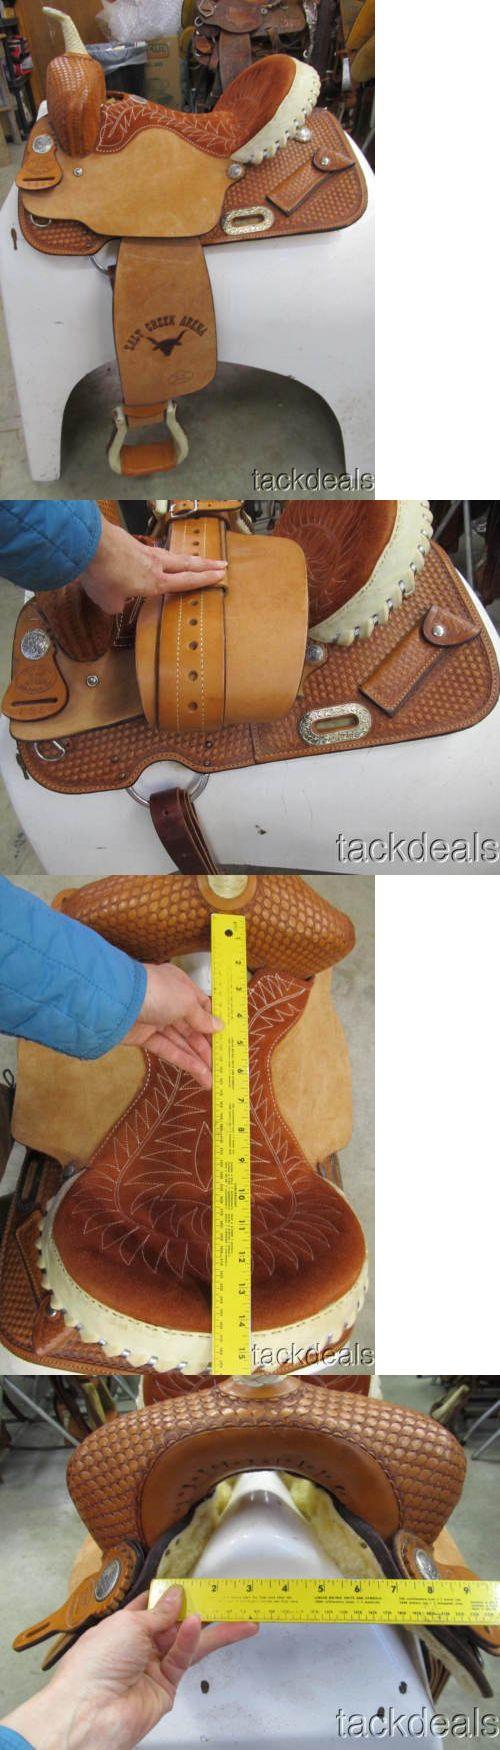 Saddles 47291: Billy Cook Barrel Saddle Ok Maker 14 New Never Used BUY IT NOW ONLY: $795.0